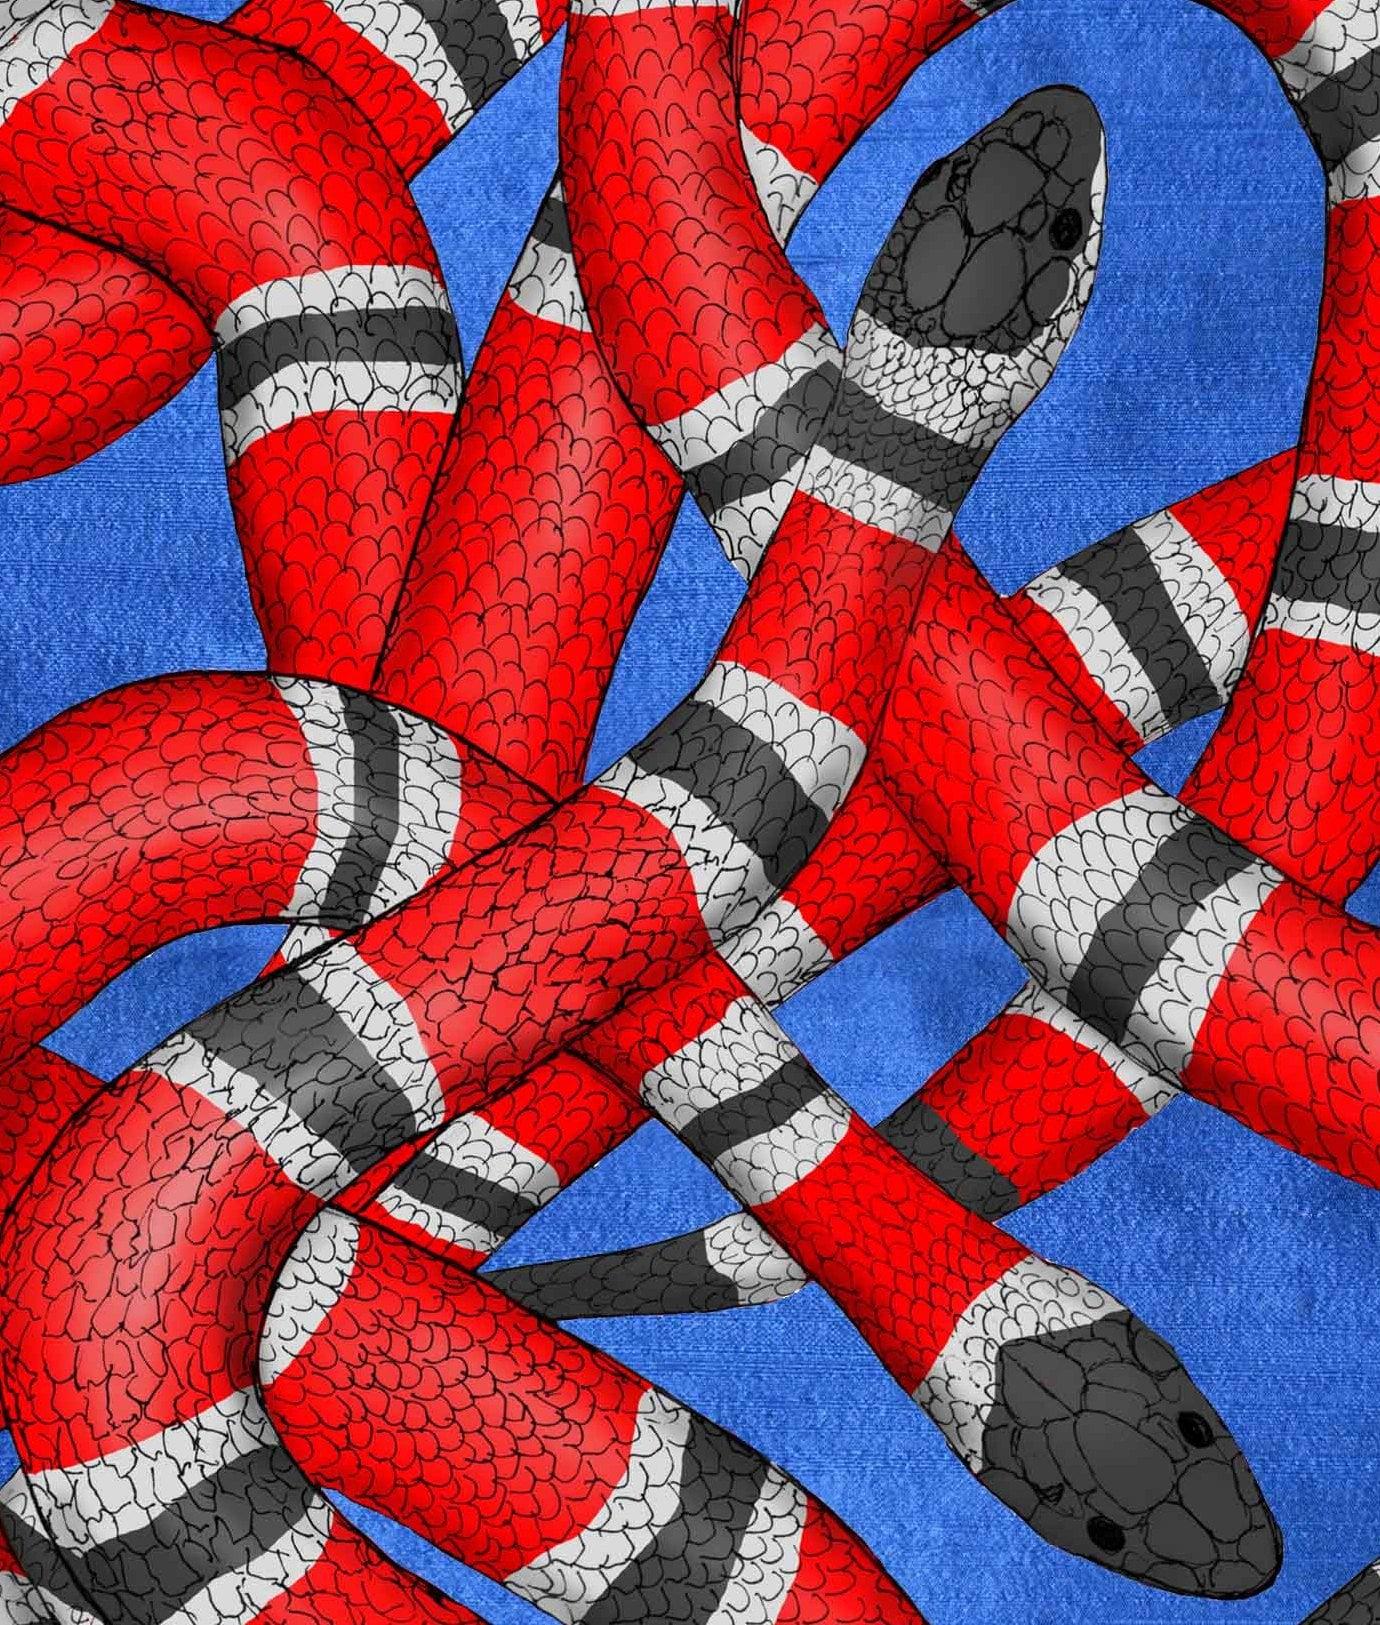 Red Snake Wallpaper, Wallpaper Removable, Removable, Gucci Wallpaper, Wall Paper, Snakes wallpaper, gucci Snakes, Snakes Wallpaper